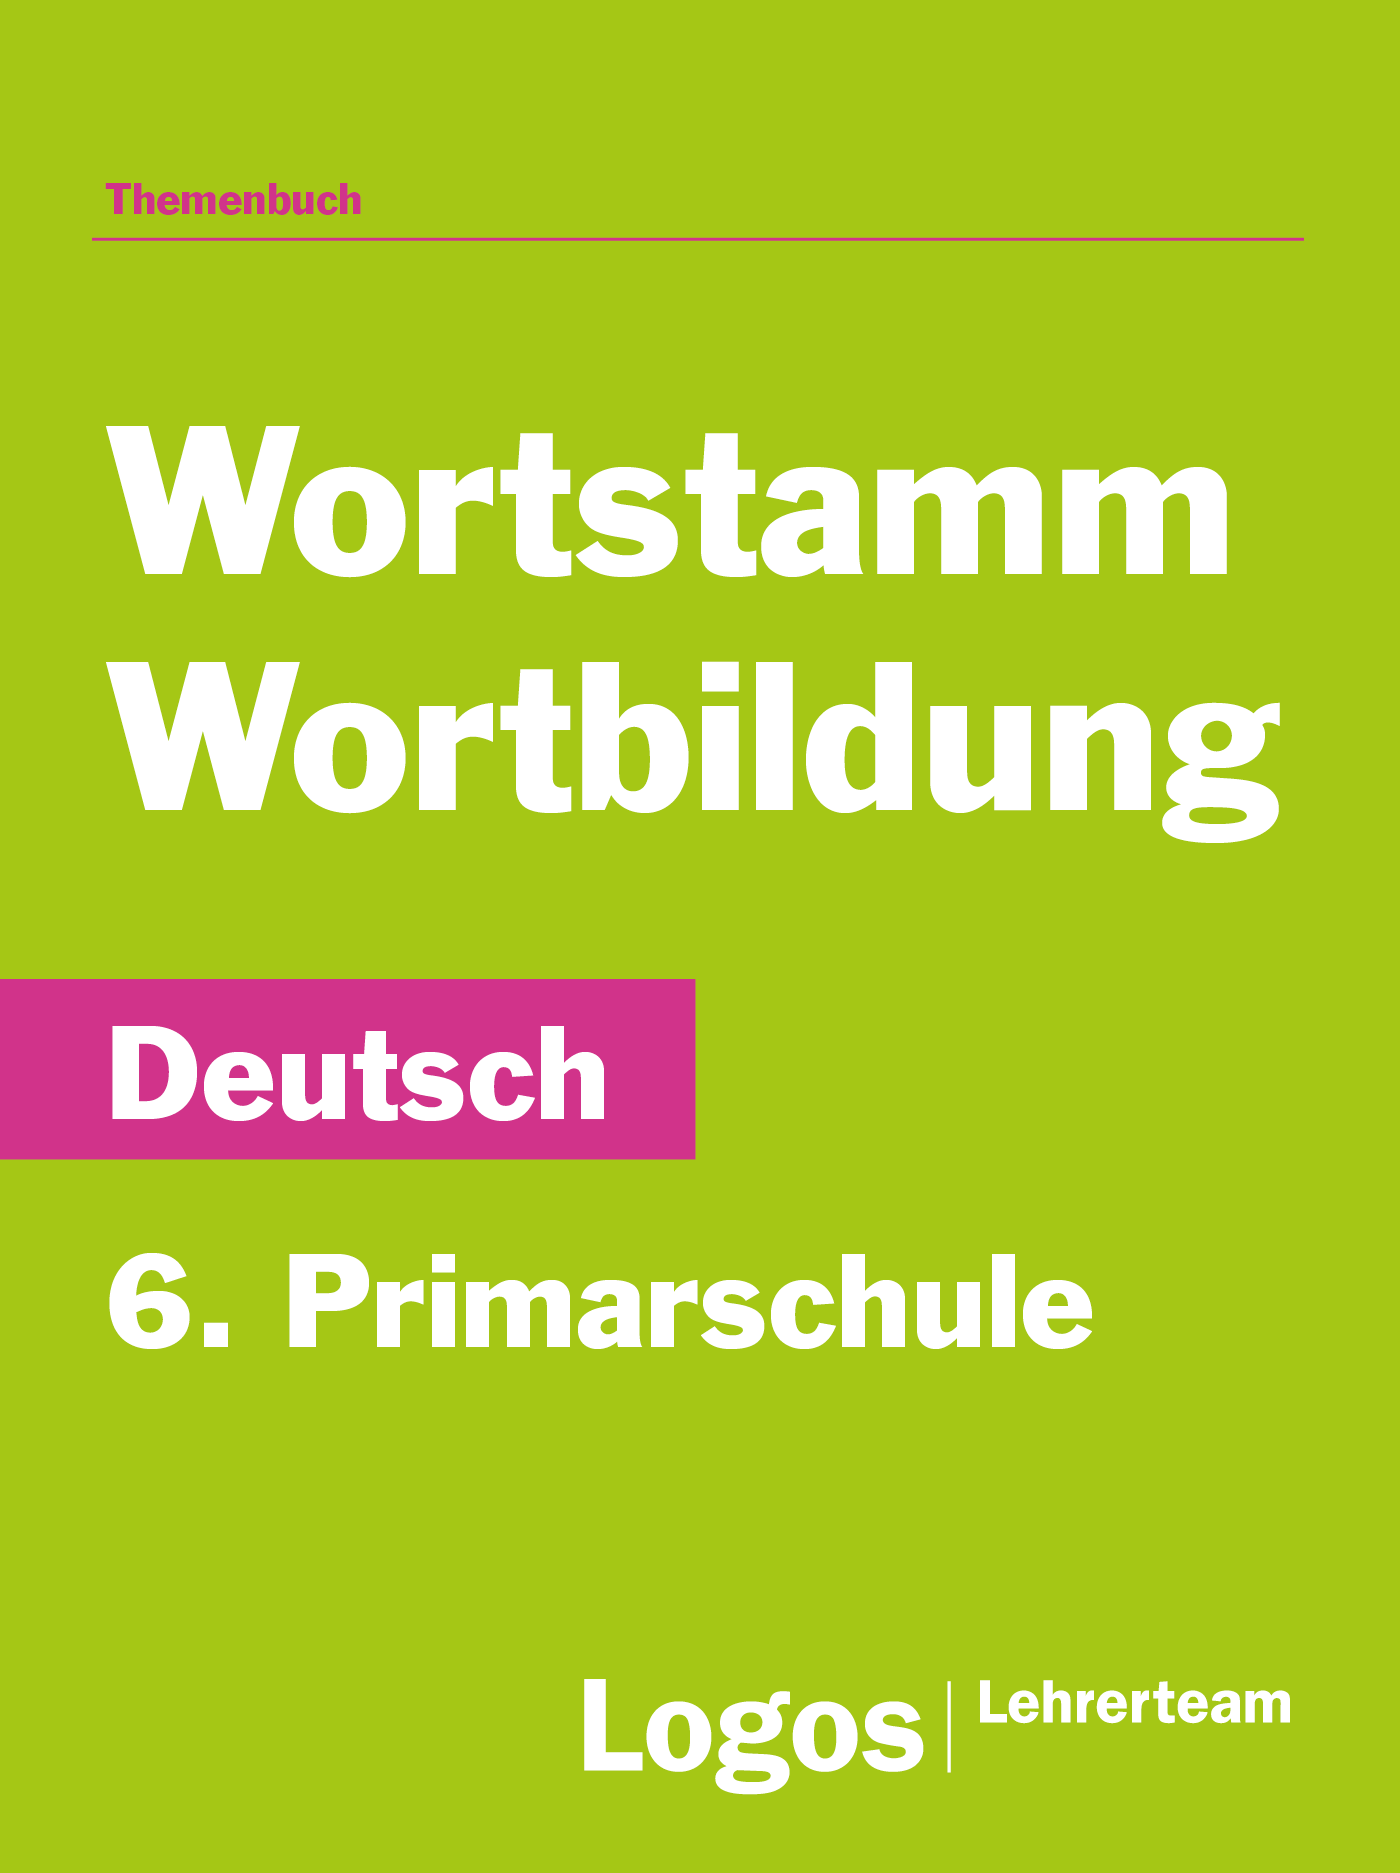 PD Wortstamm.png